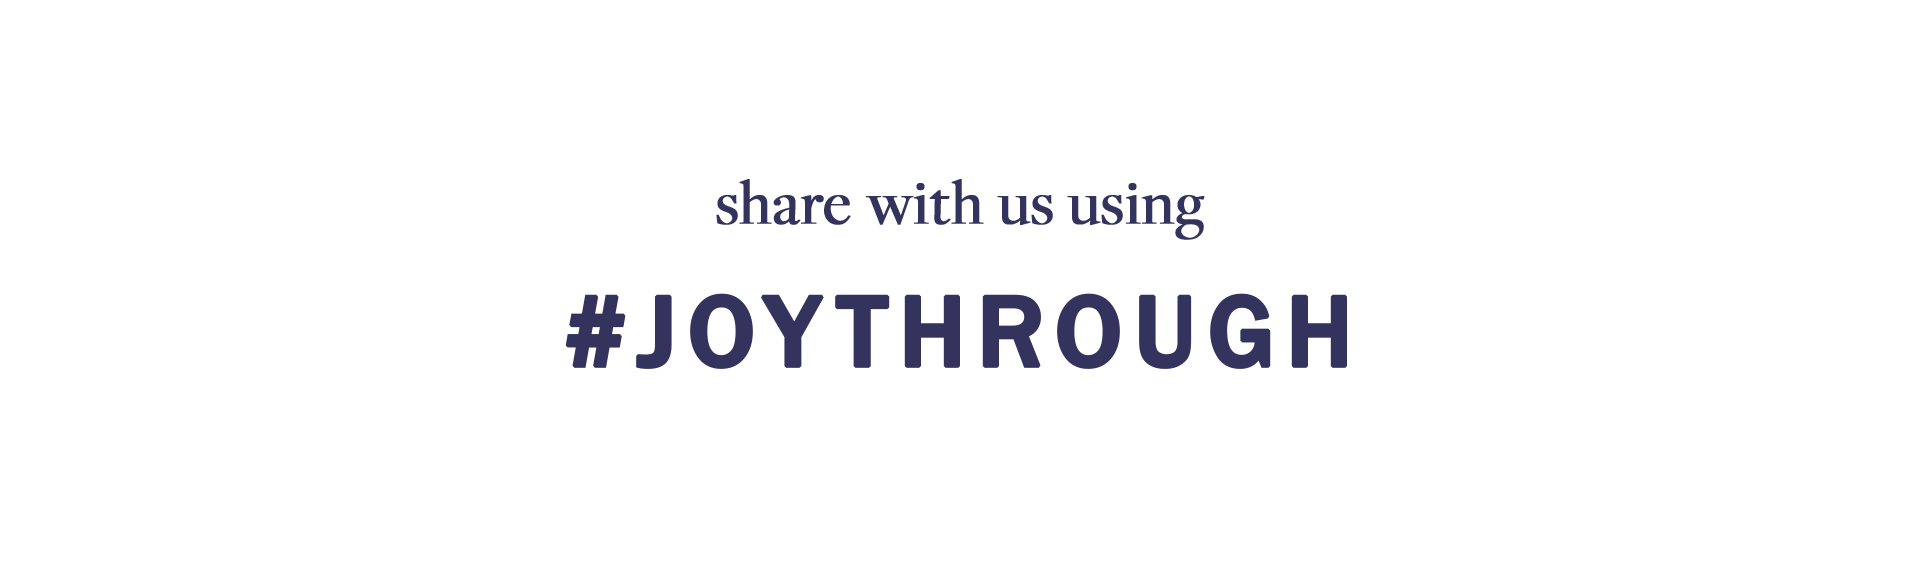 #JoyThrough